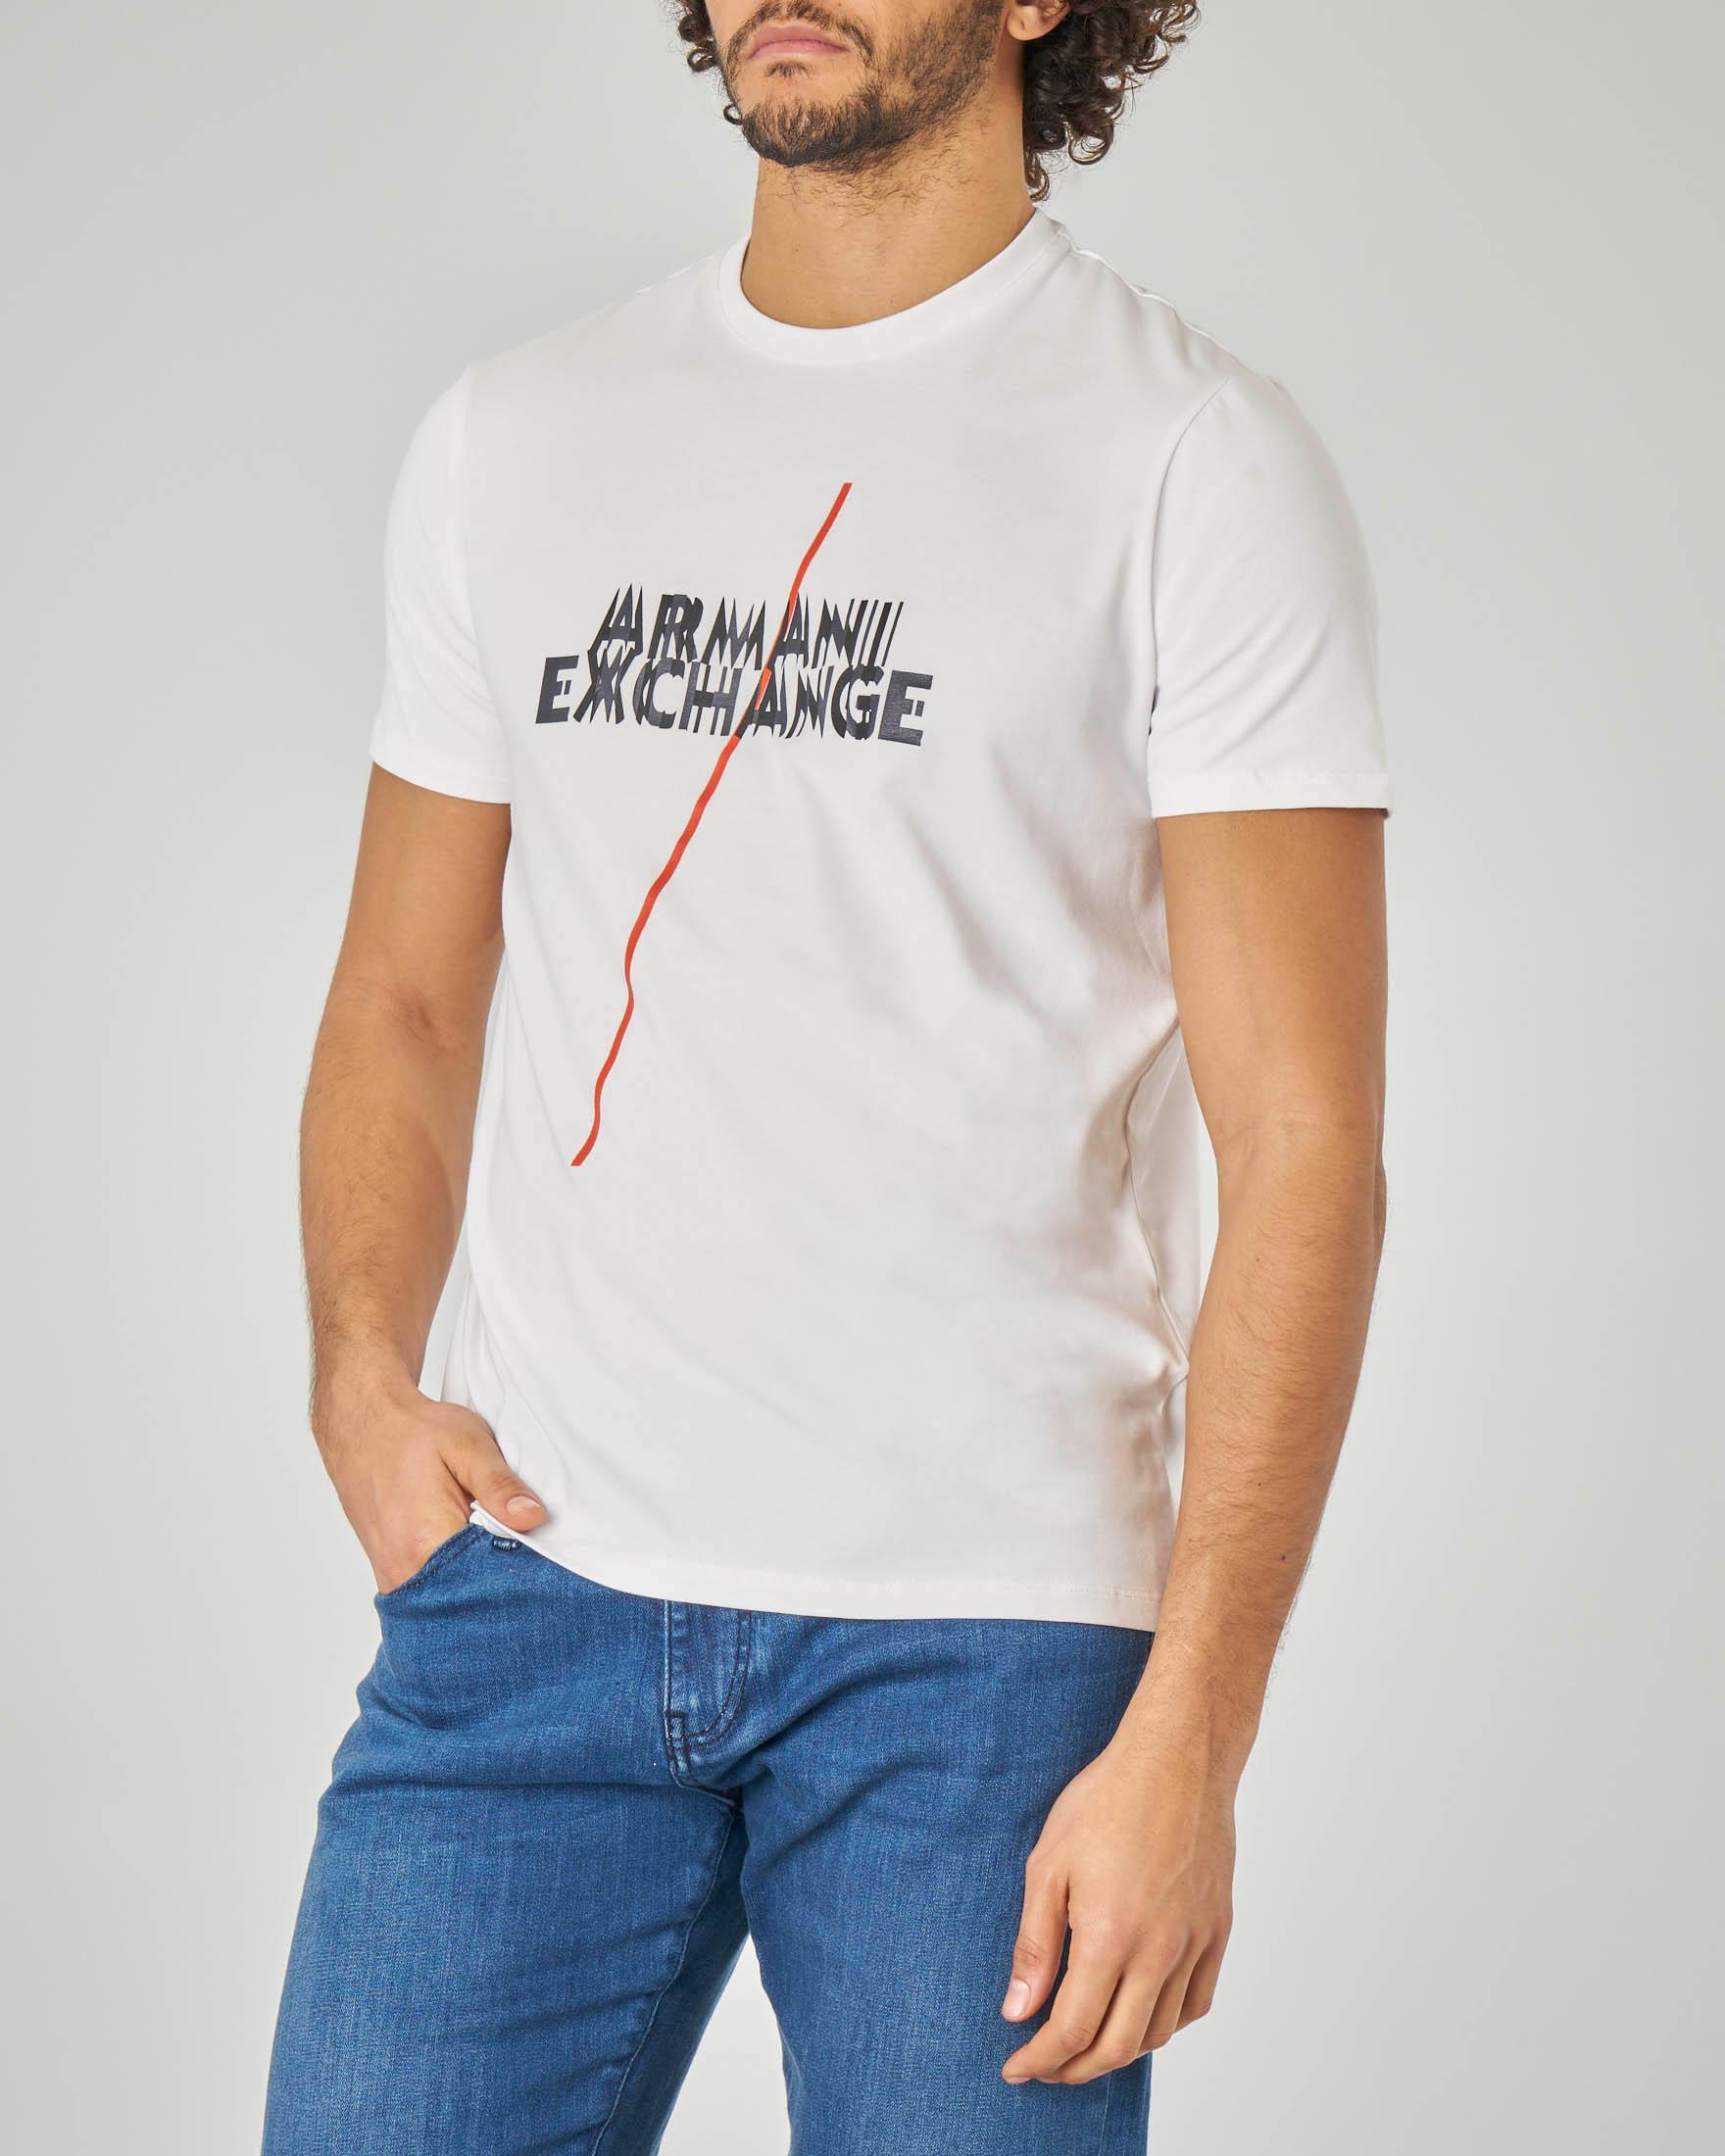 T-shirt bianca silm con logo e riga rossa